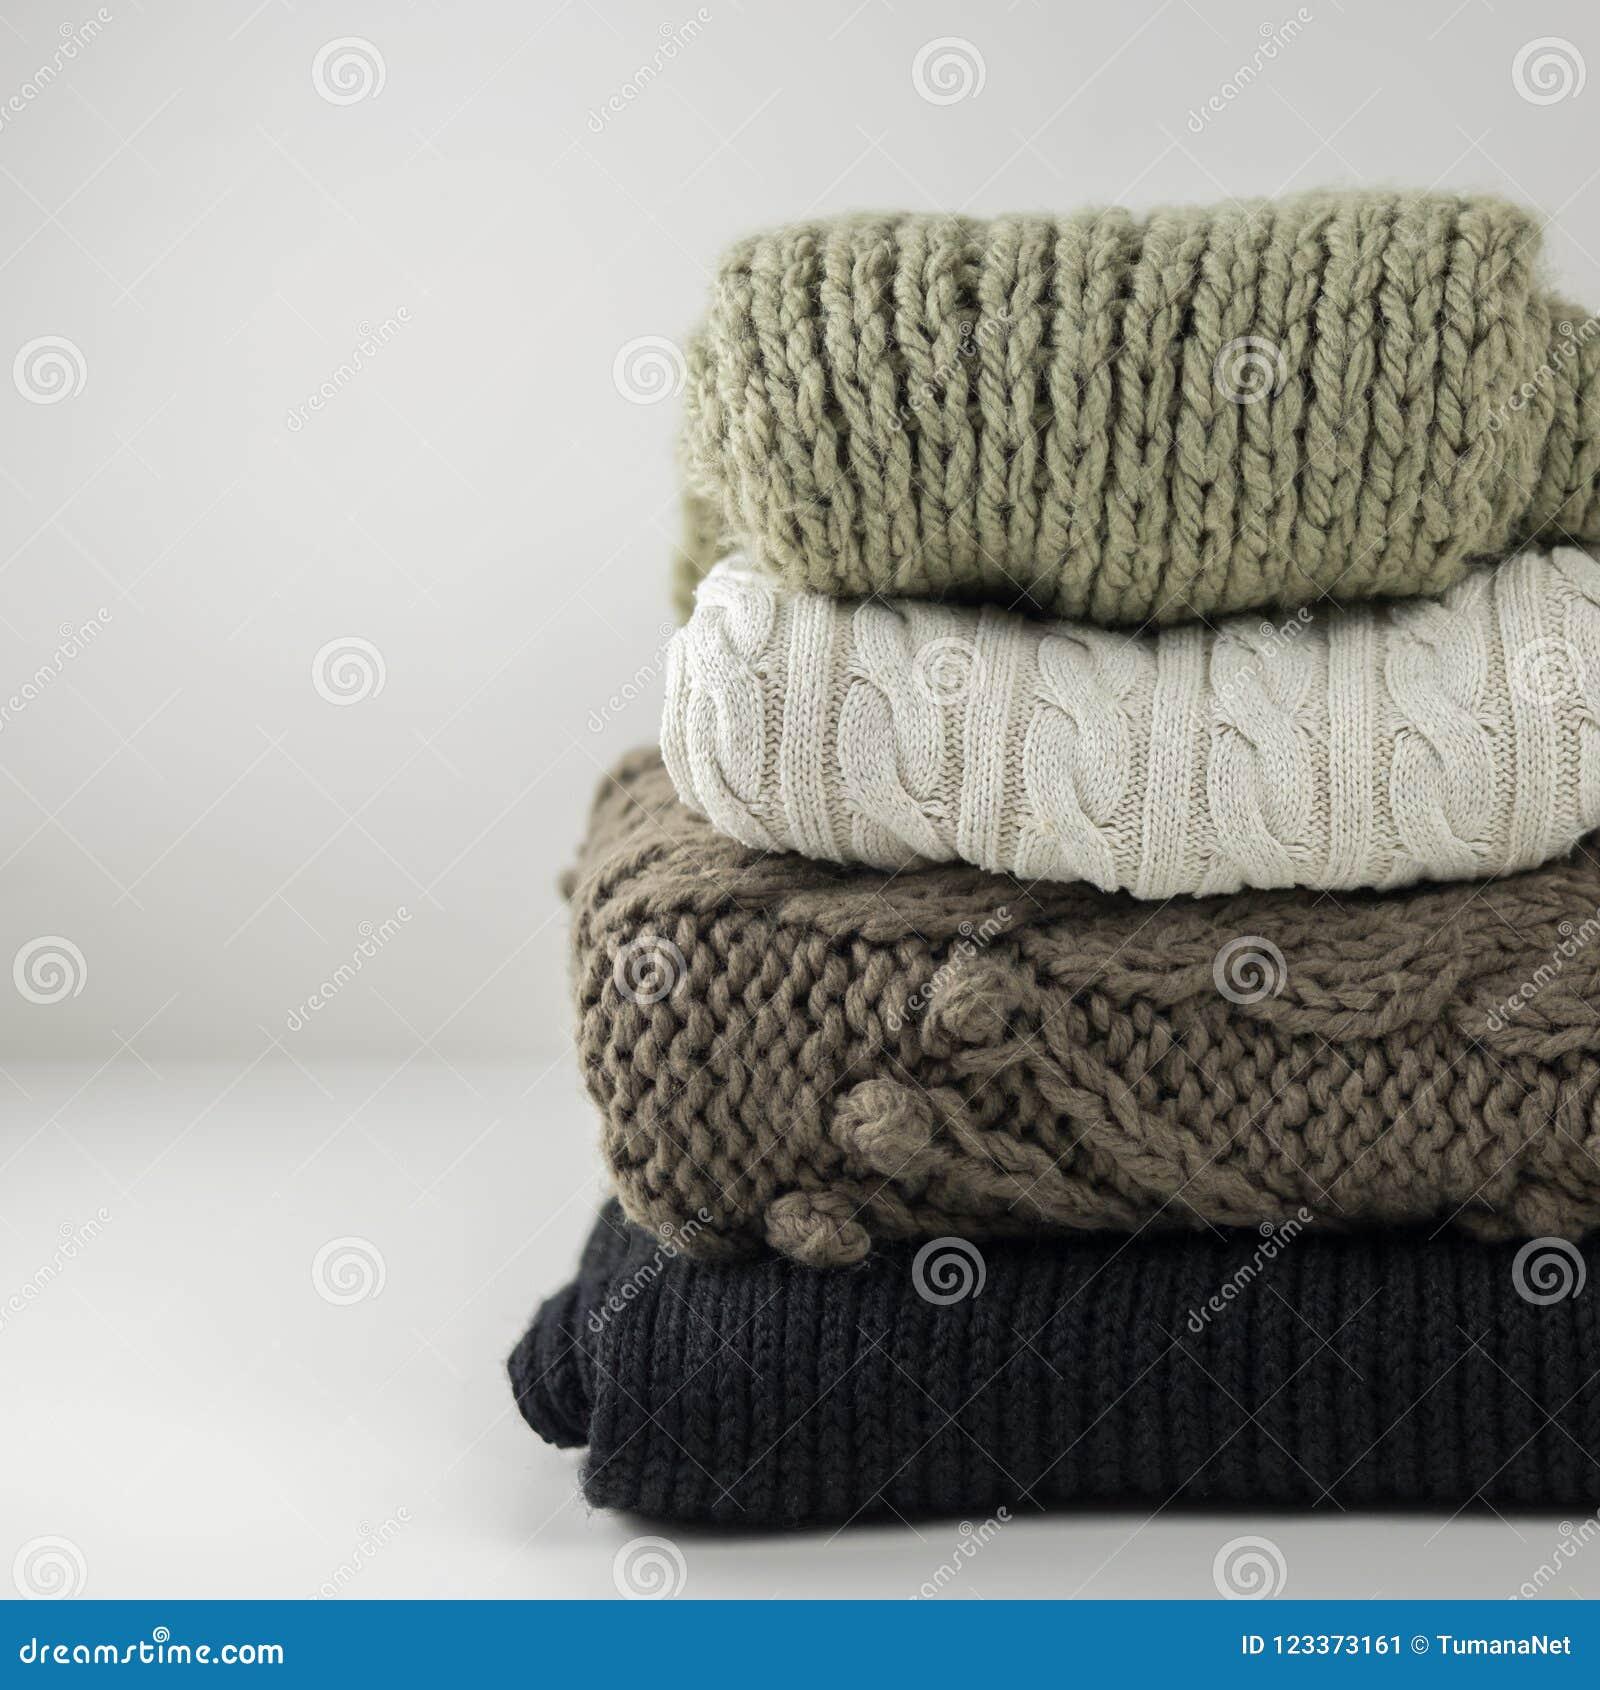 cd994adf29d0 Θερμά μάλλινα πλεκτά ενδύματα χειμώνα και φθινοπώρου